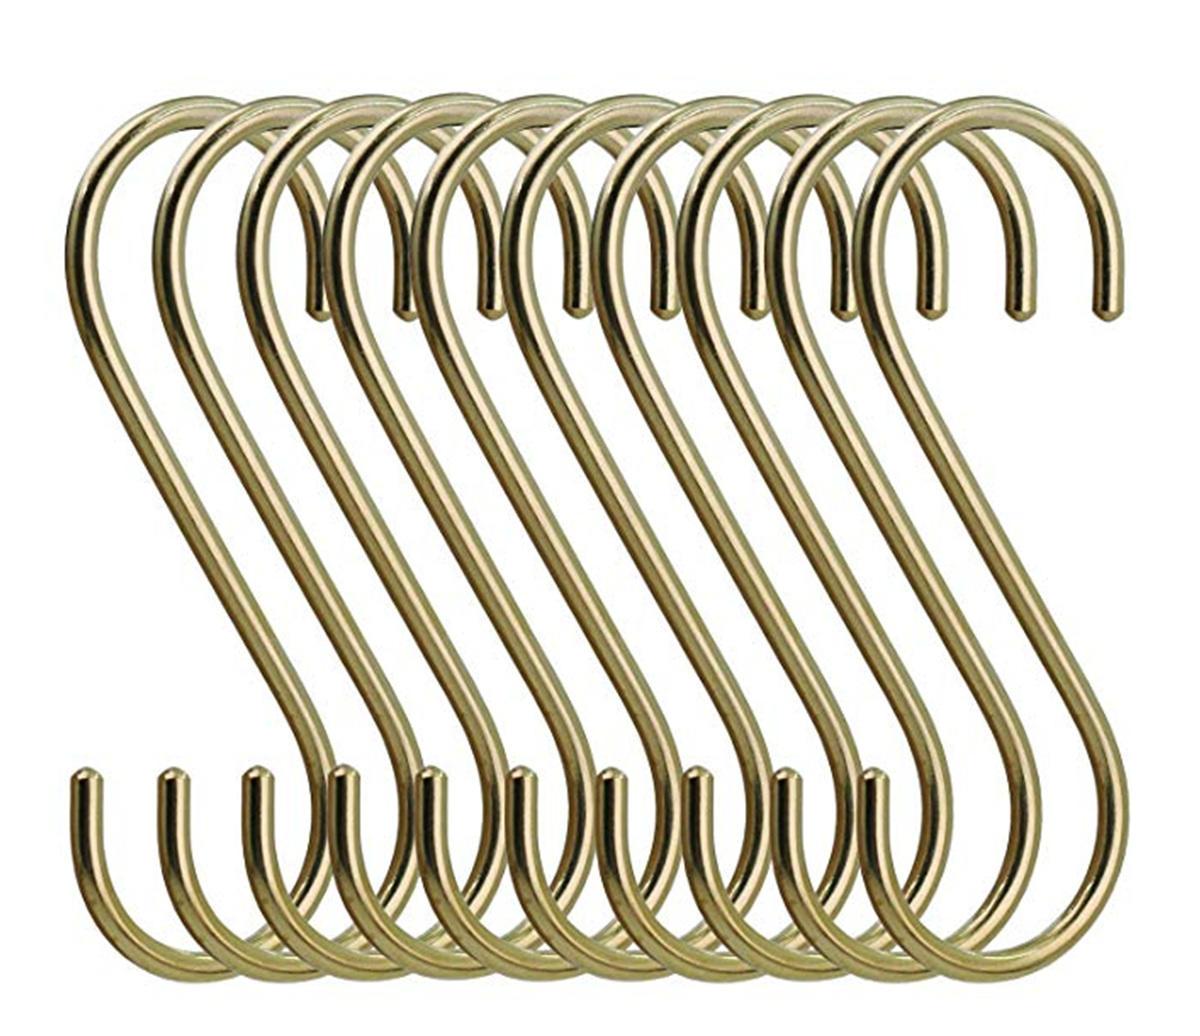 Metal rose copper S hook for household